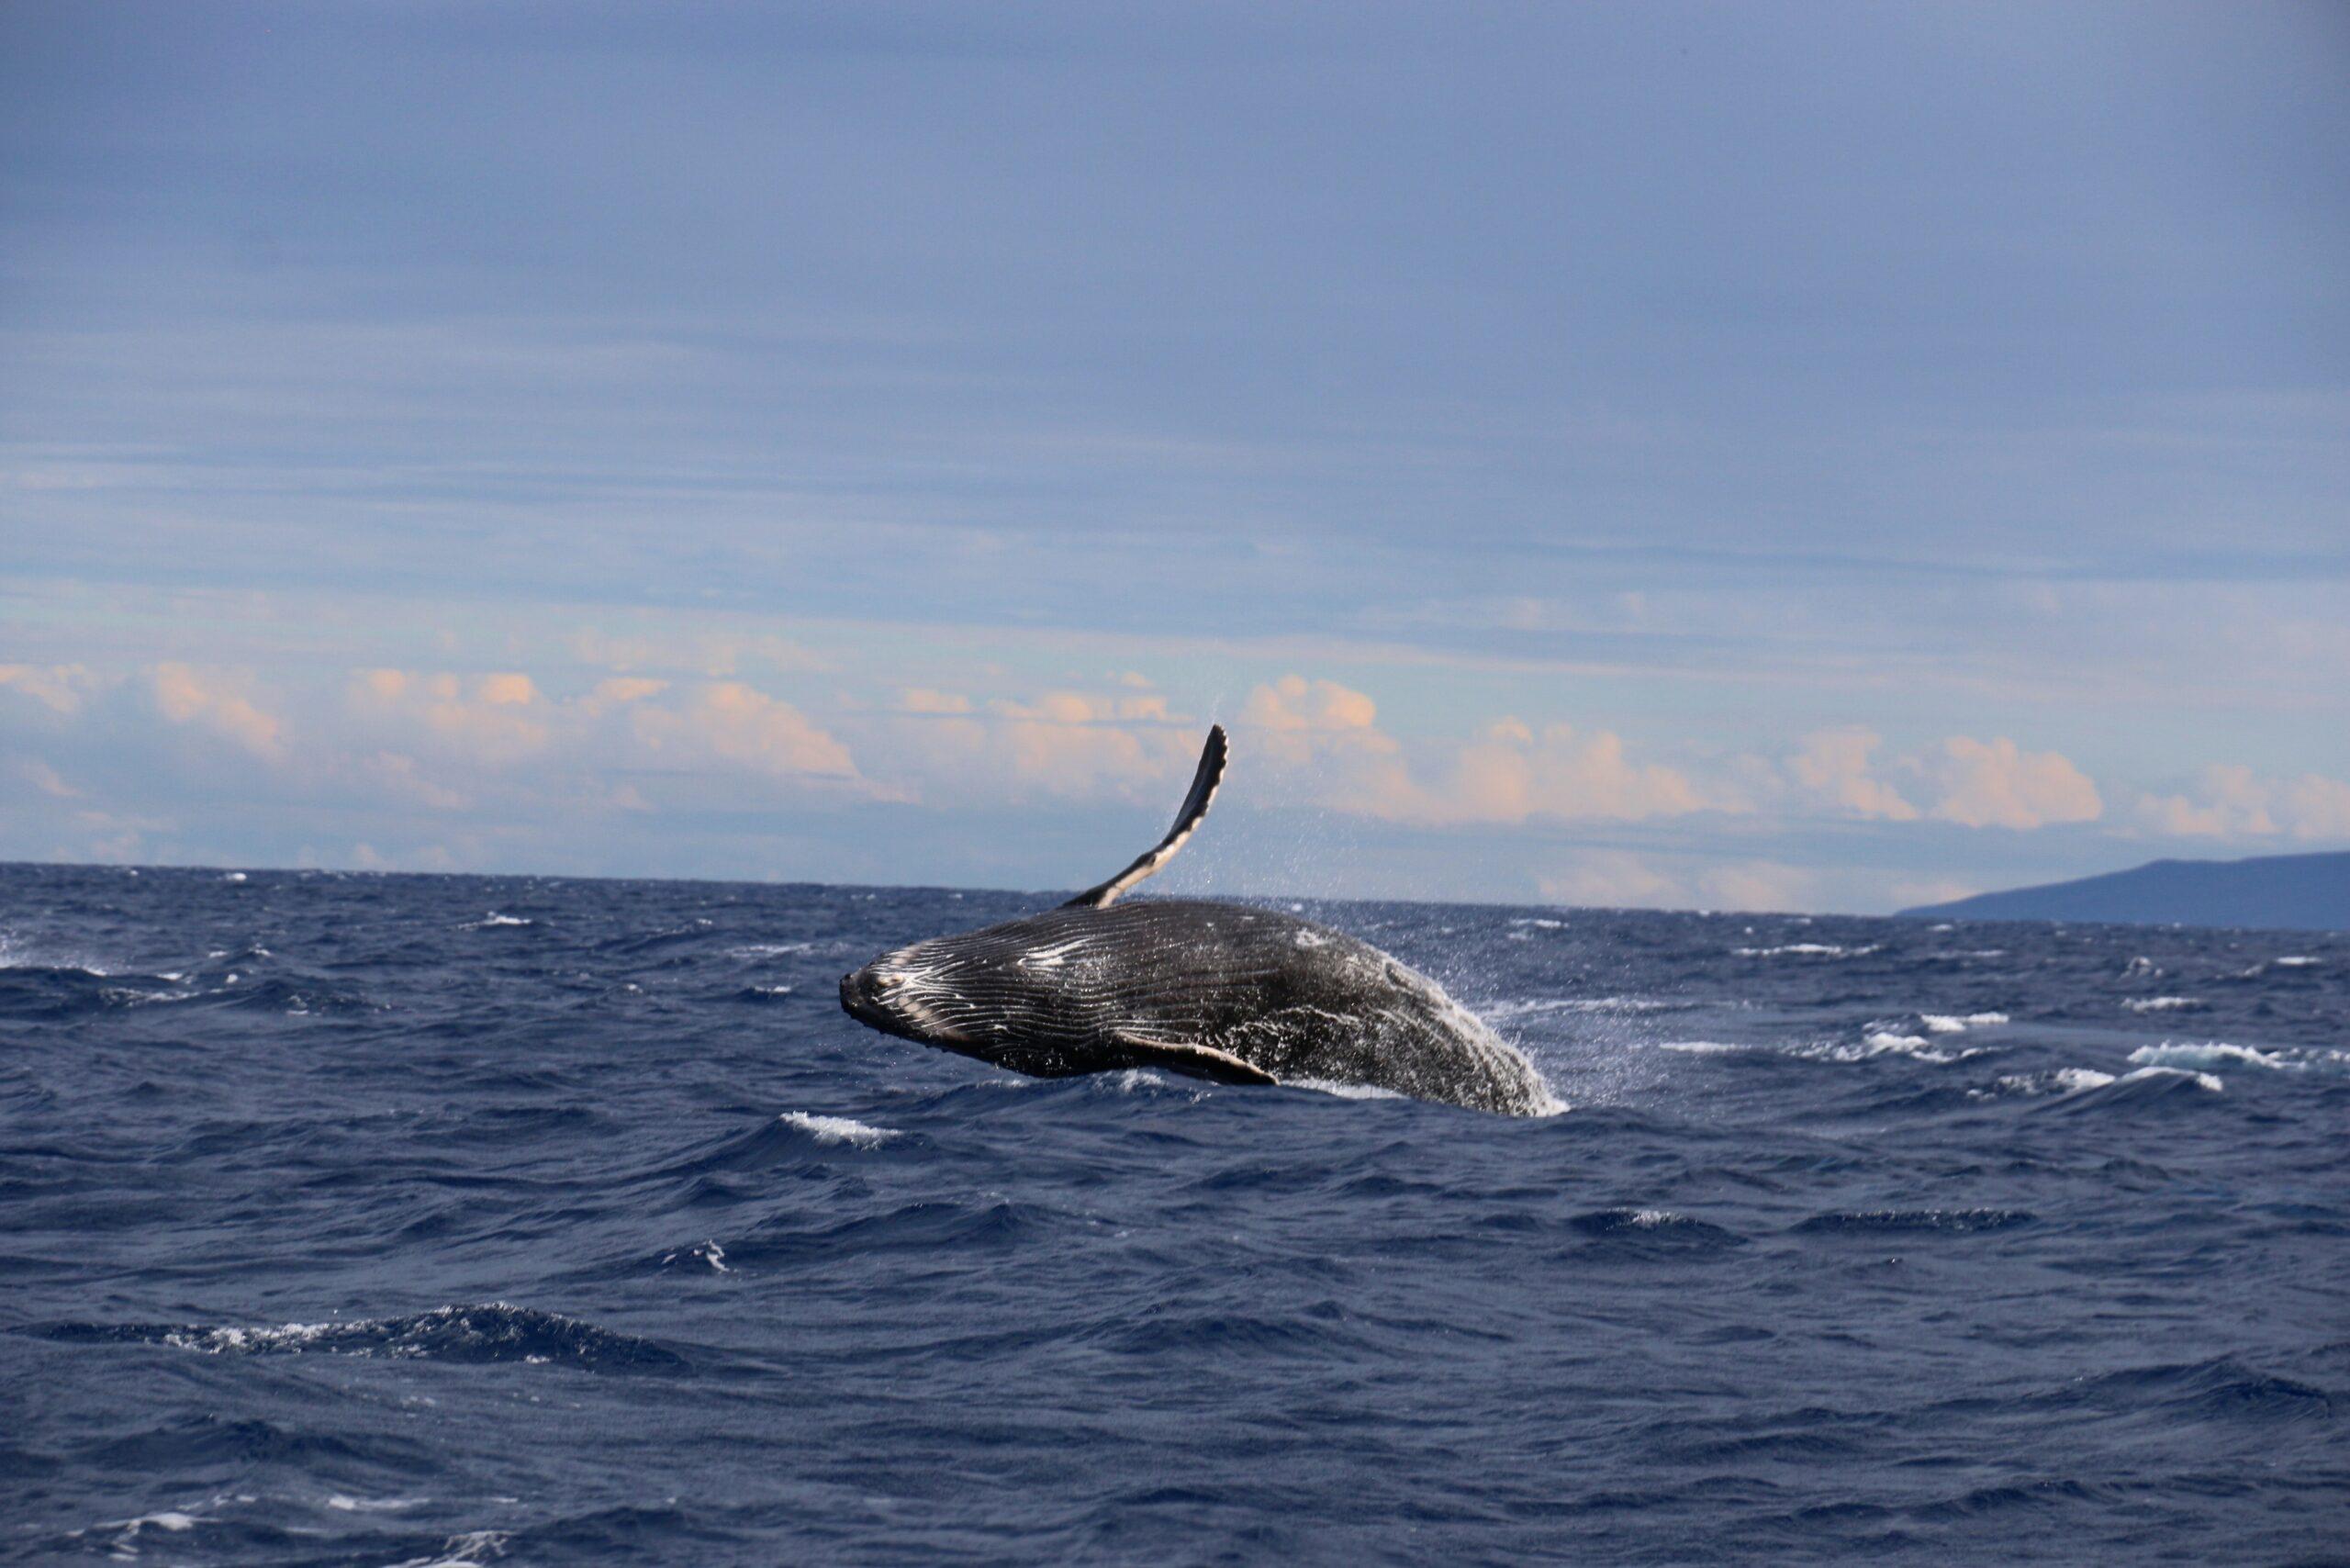 joshua-sukoff-Whale surfacing-unsplash